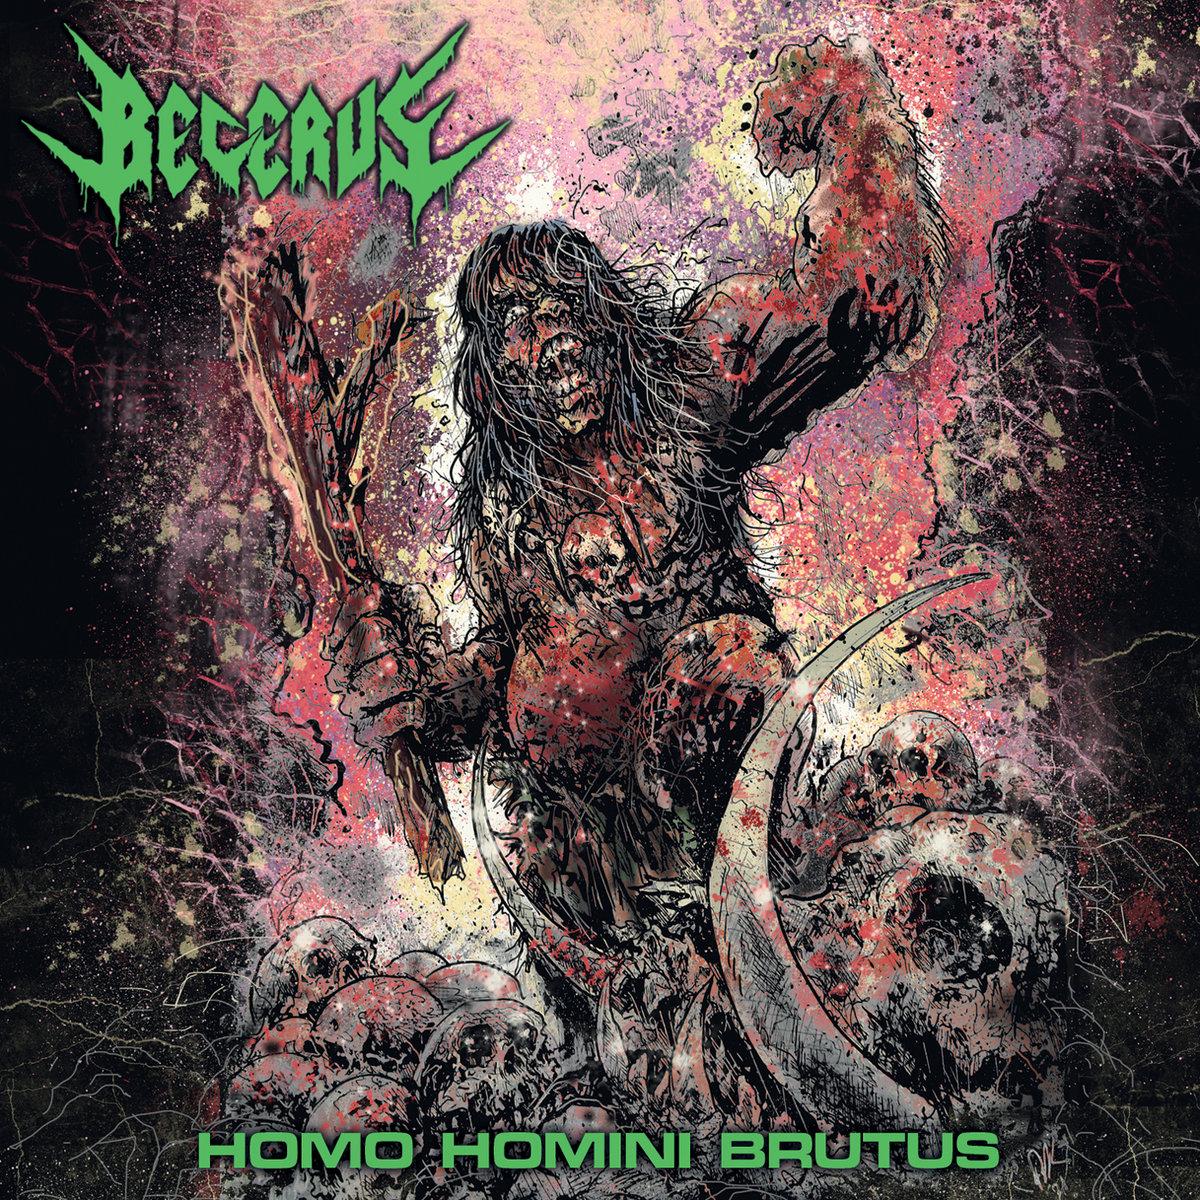 Becerus Homo Homini Brutus Album Cover Artwork